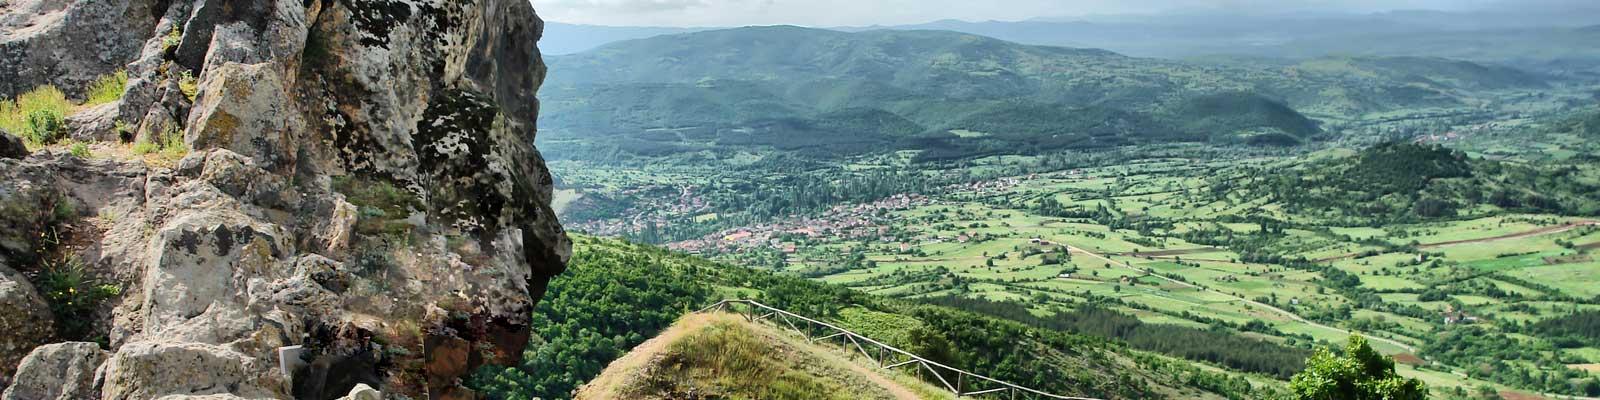 Panama Montanhas Verdes